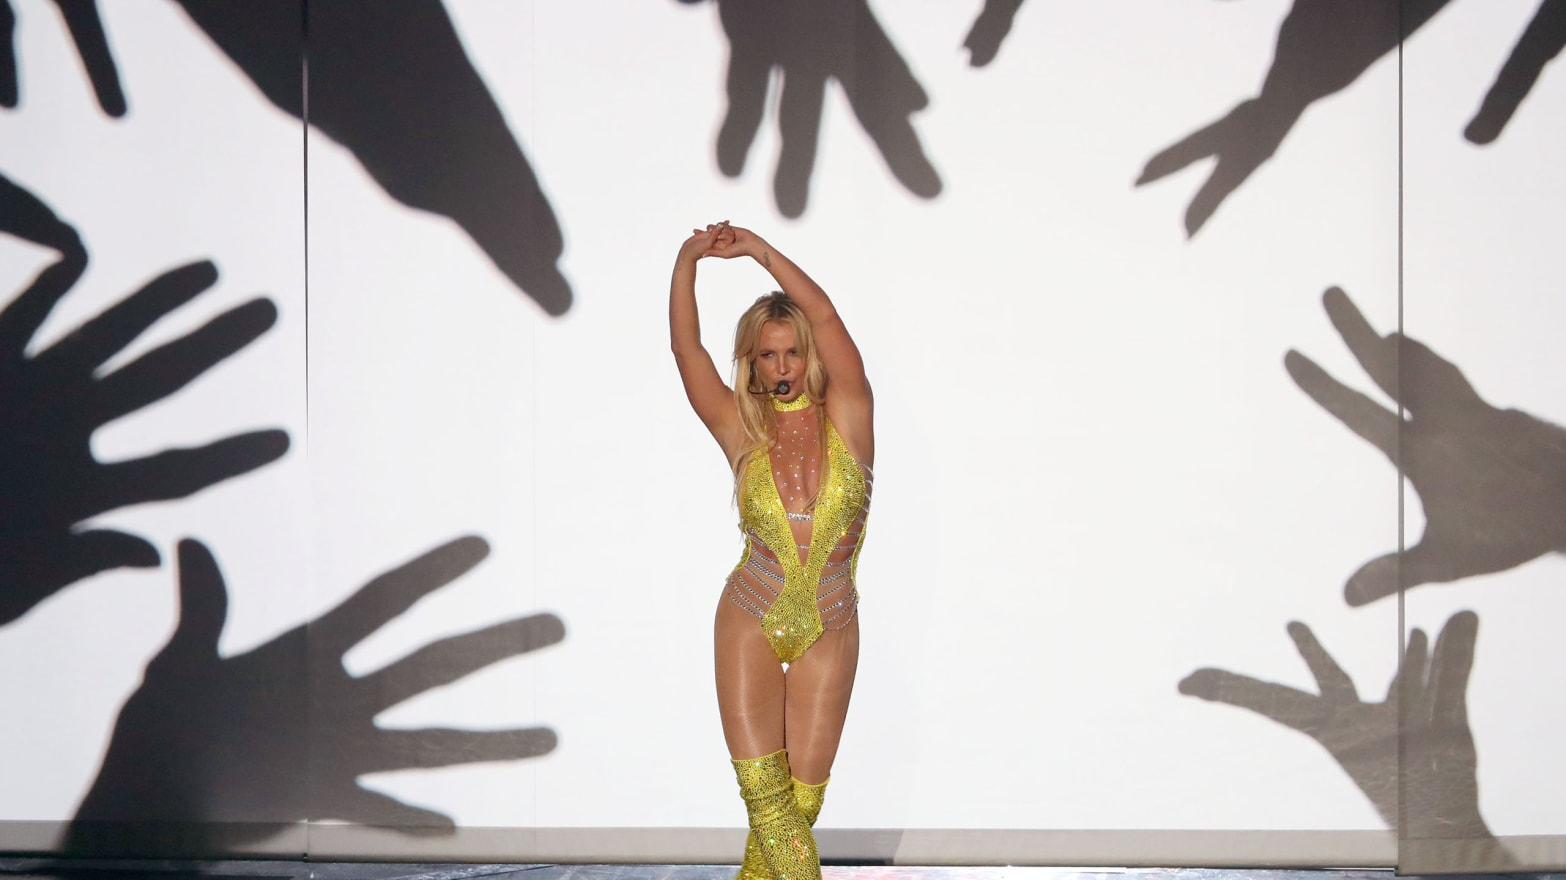 Britney spears hook up live